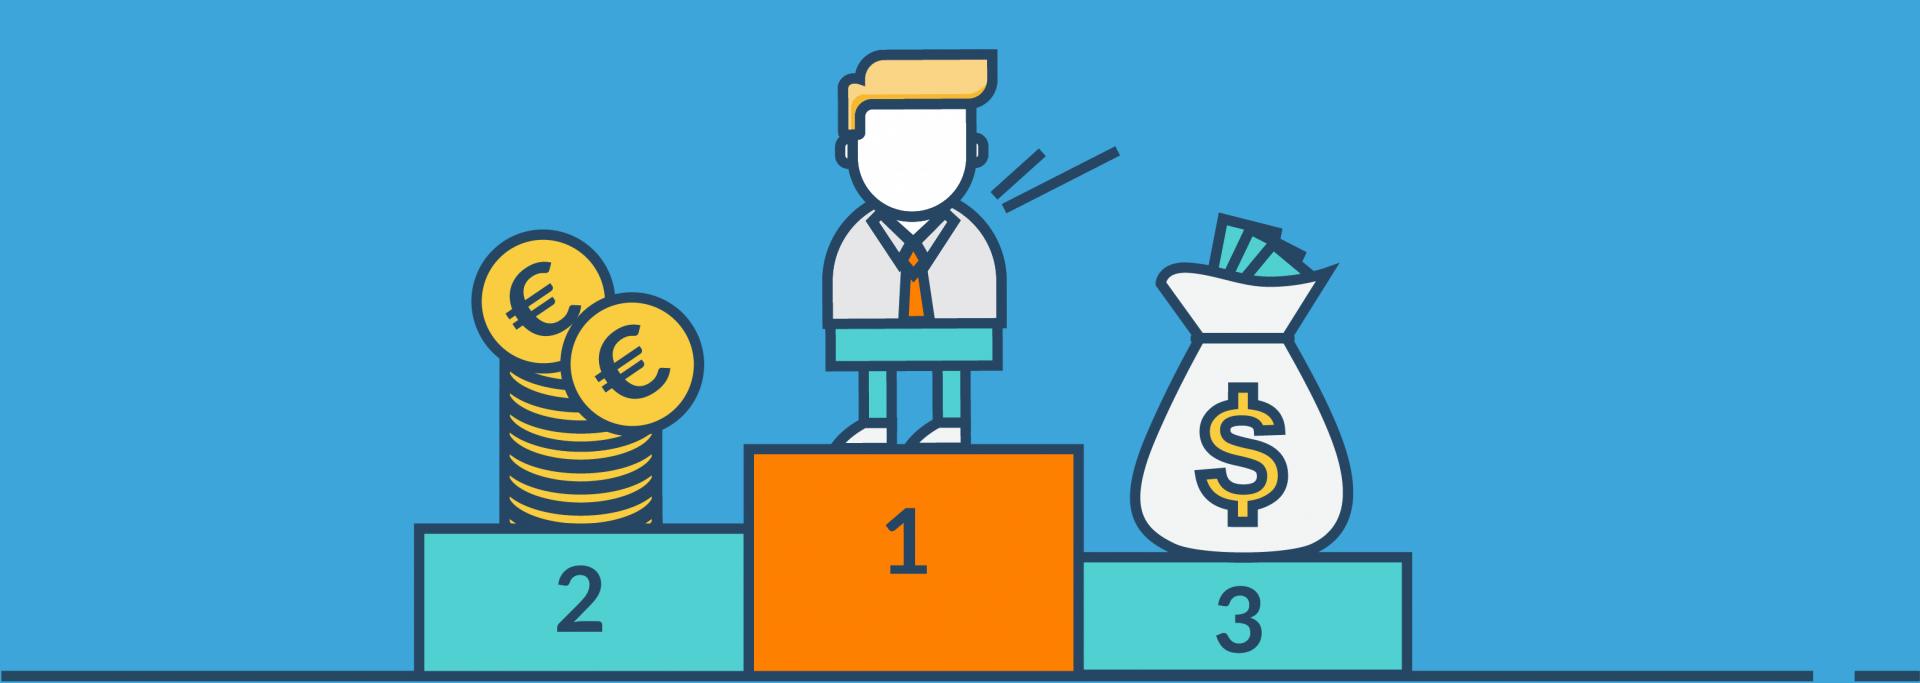 FiP.S Core Values Bilder Kunder Vor Profit: Siegerpodest